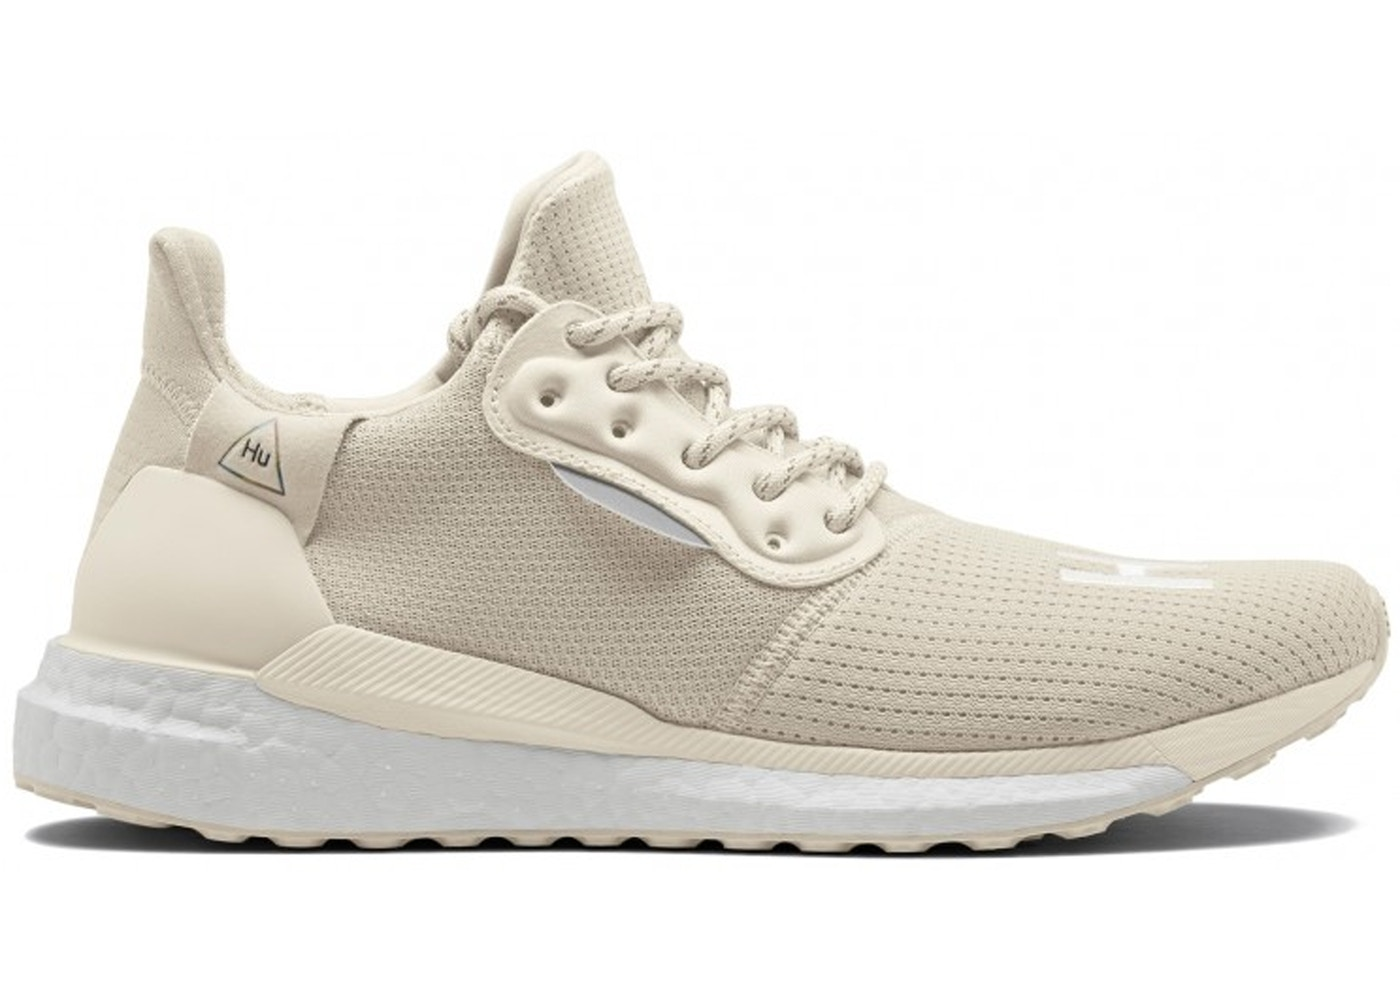 new style 1212b aac6e adidas Solar Hu Pharrell Greyscale Pack Off White